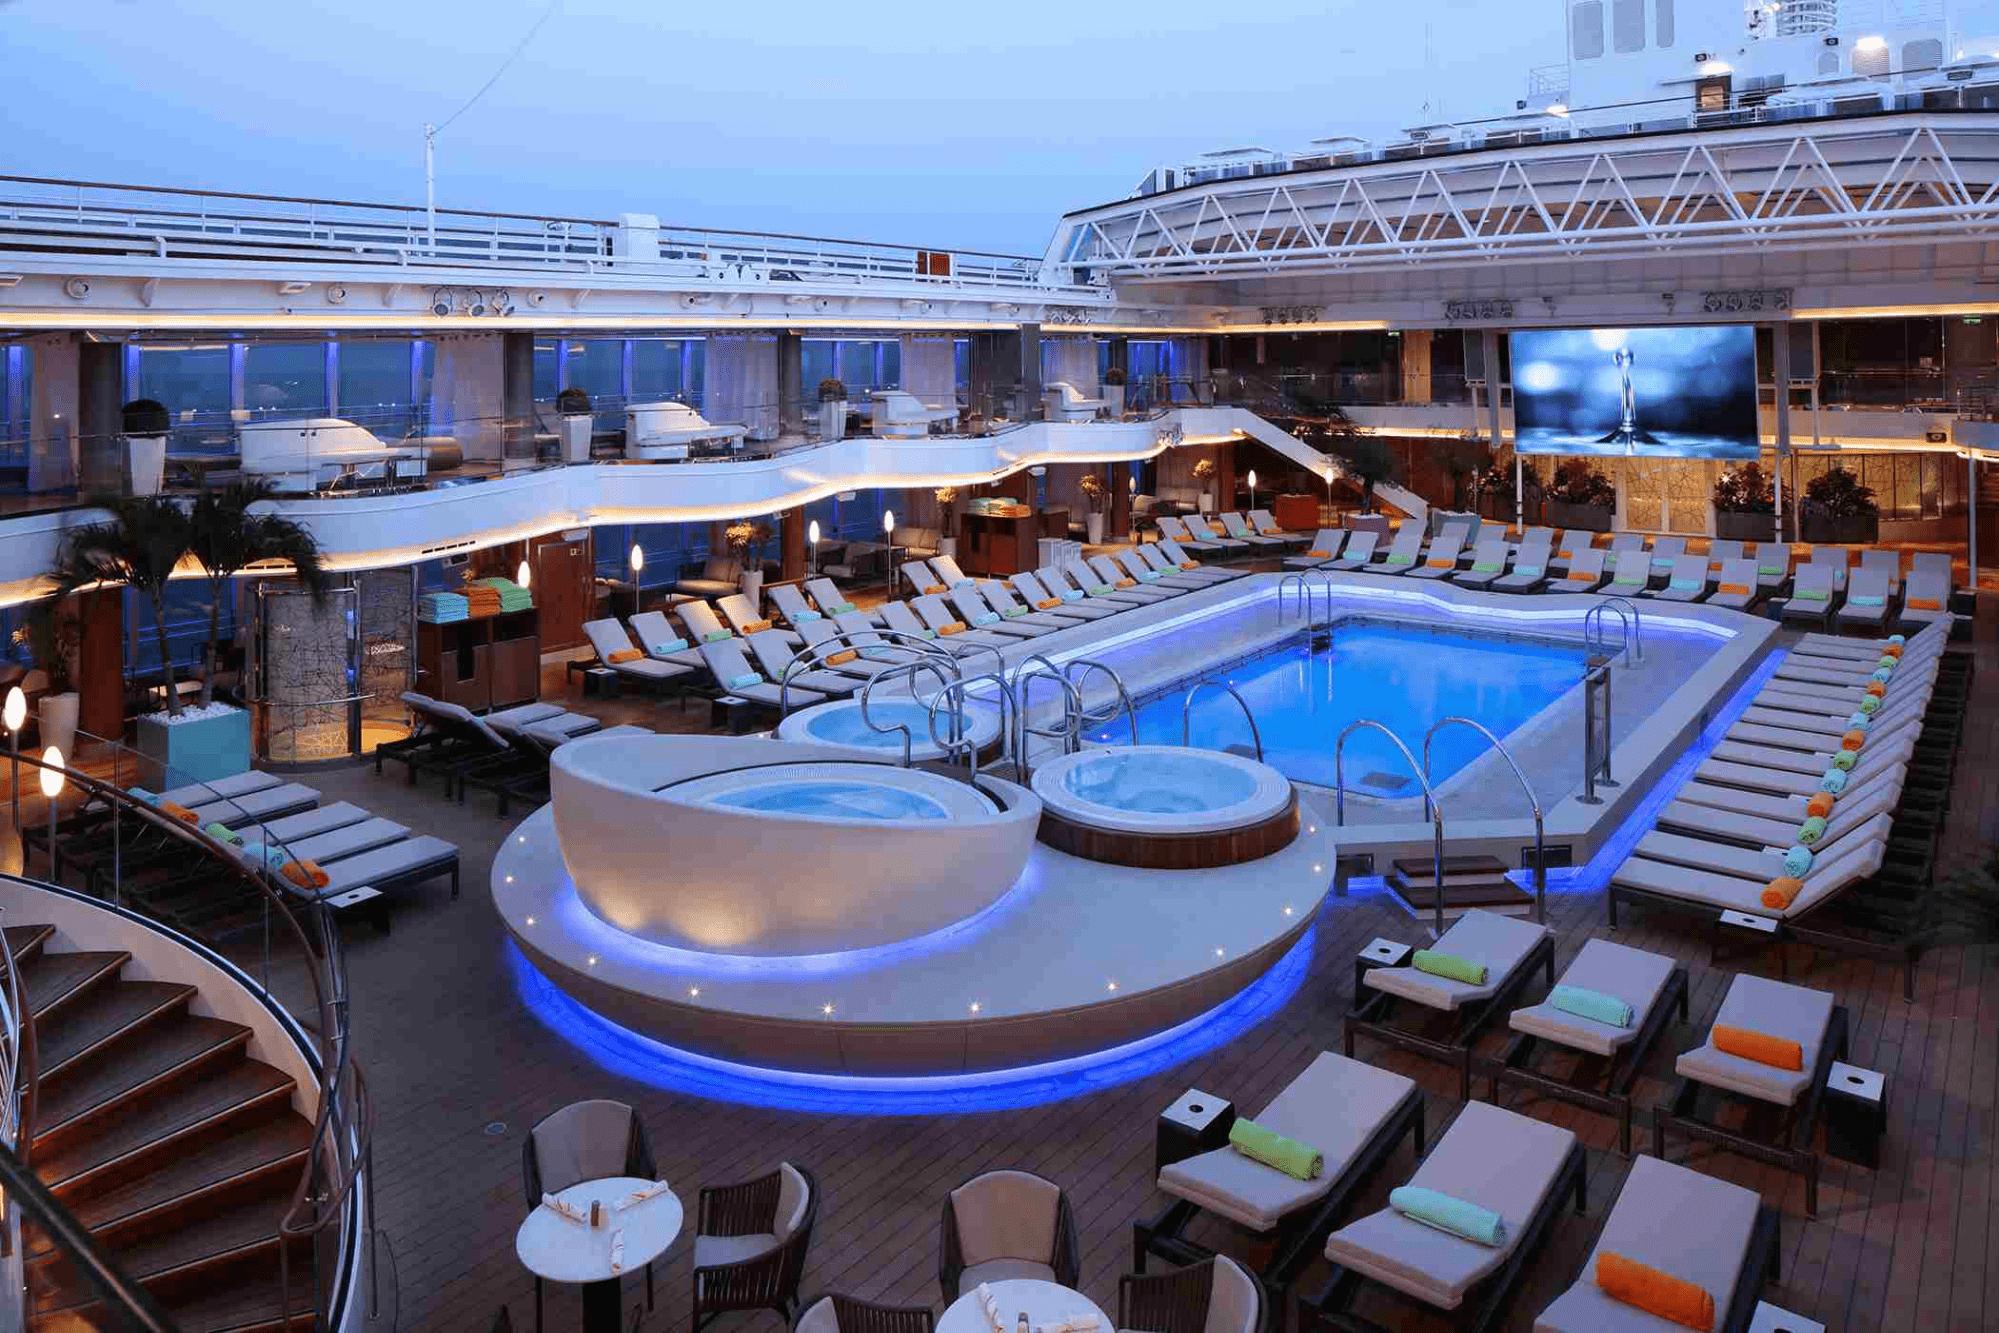 Holland America pool deck